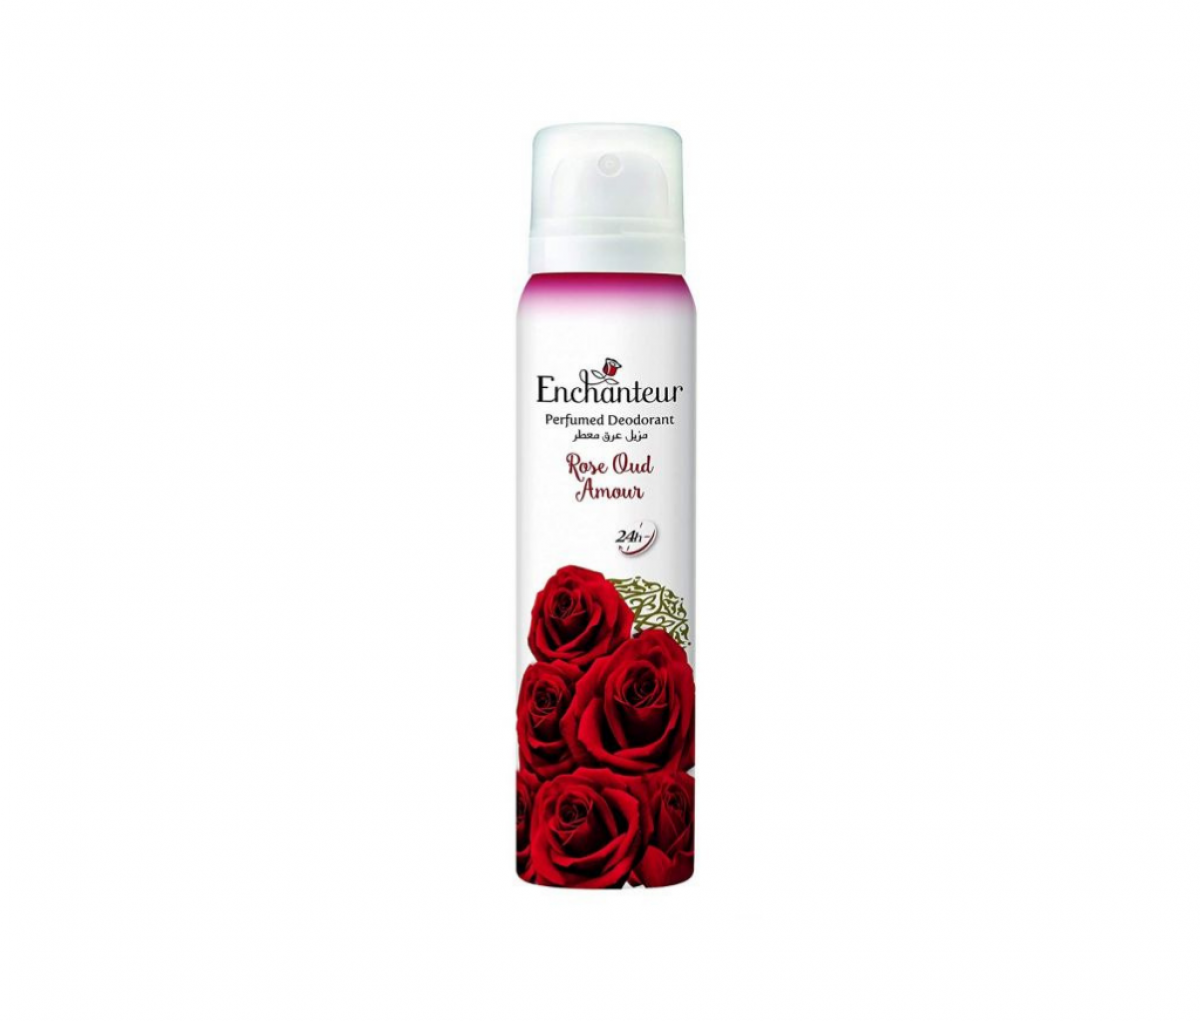 Enchanteur Deodorant 150ml Rose Oud Amour